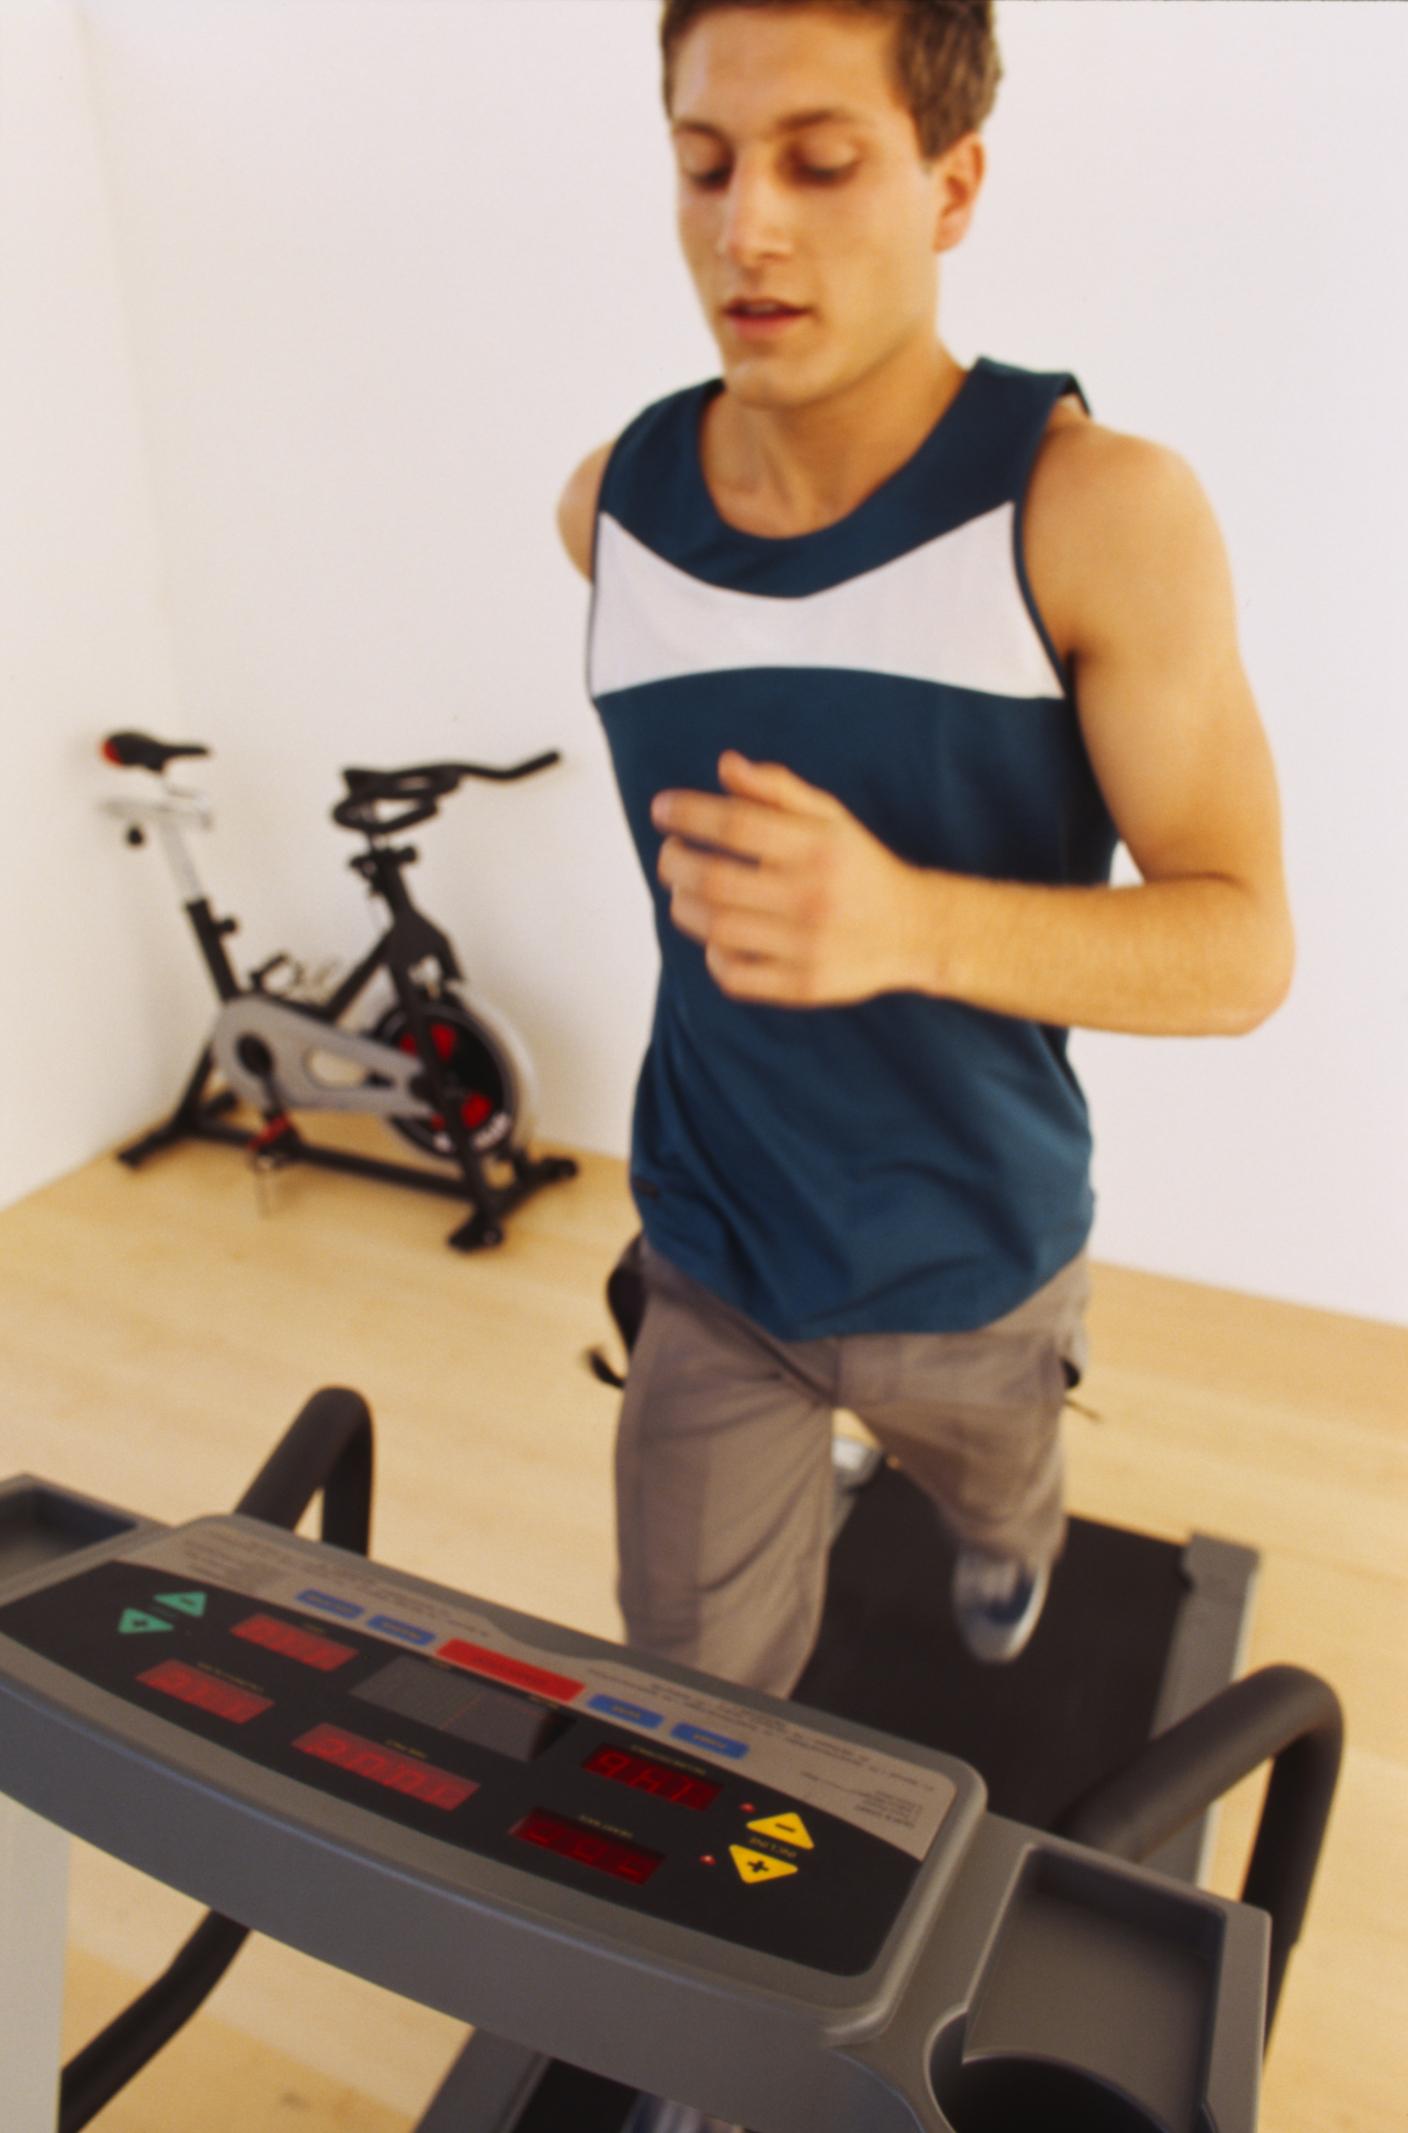 The Proform 545s Treadmill Vs The Proform Xp 650e